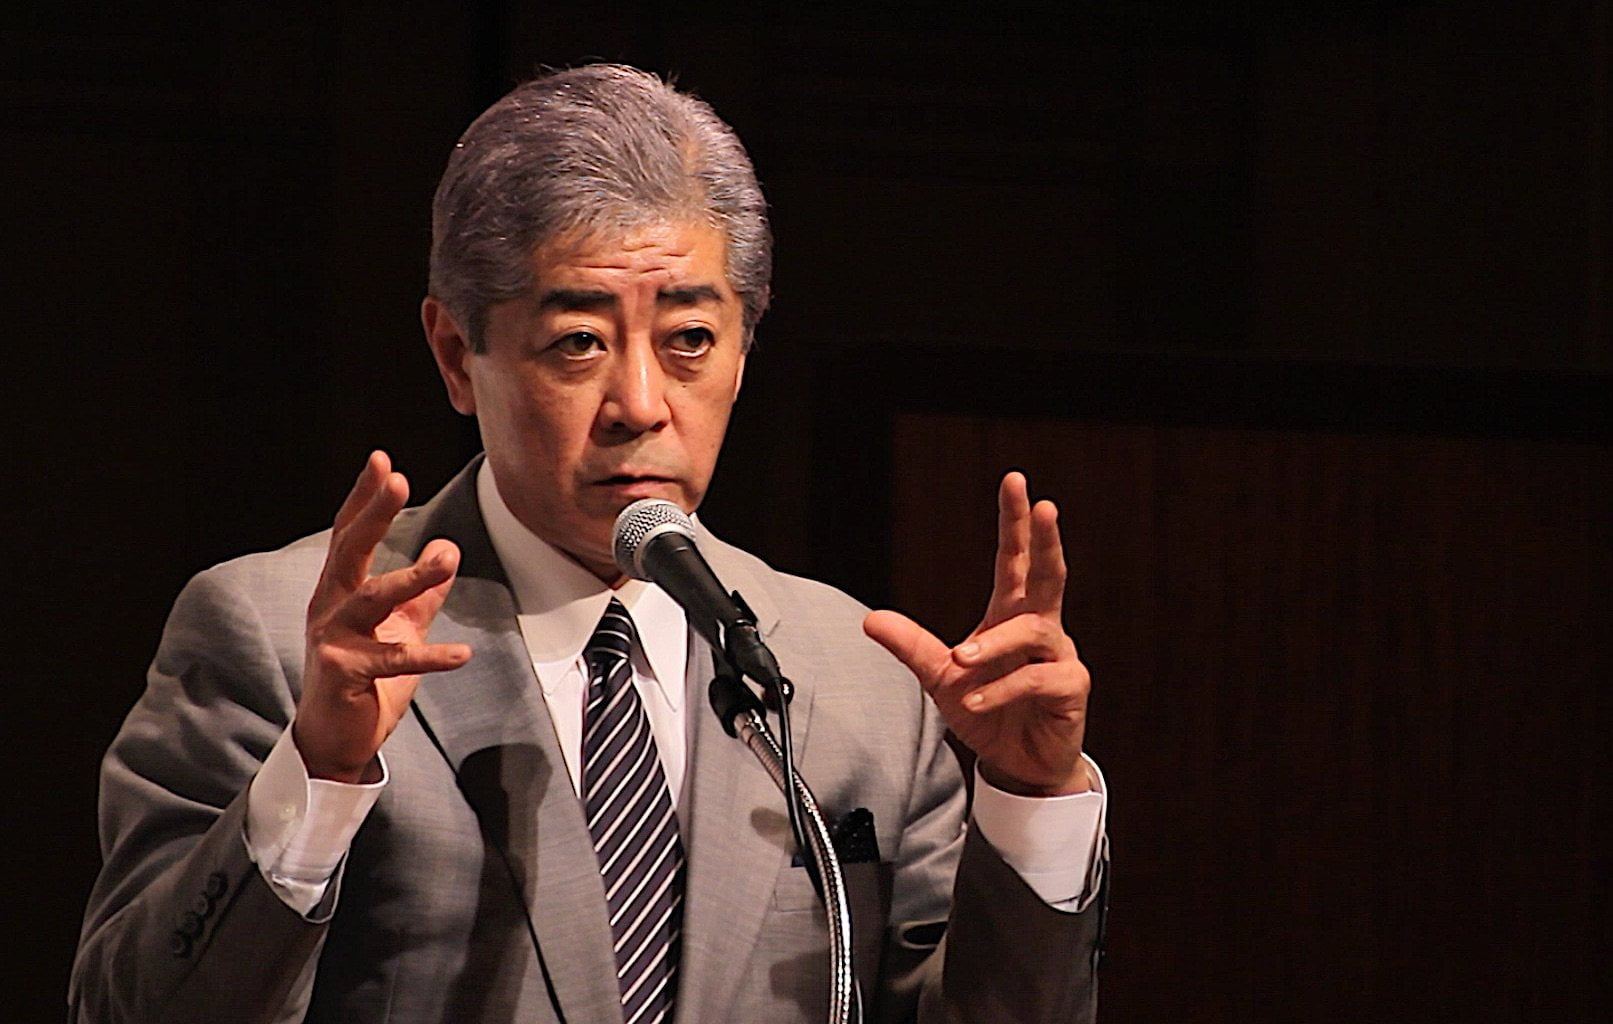 Japanese Defence Minister Takeshi Iwaya Denies Cash Bribary